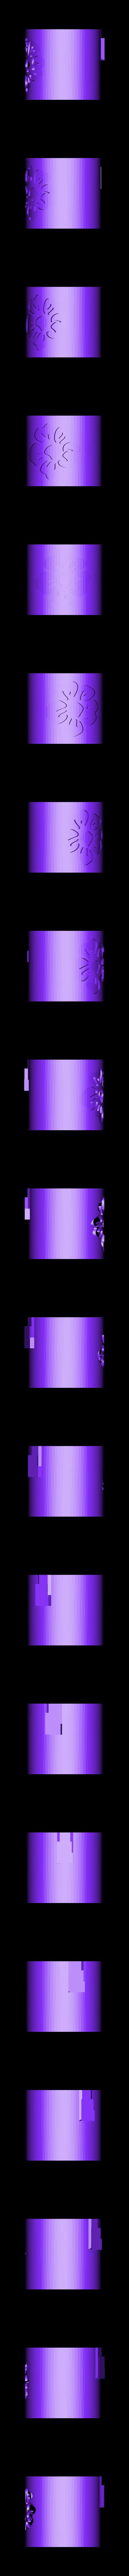 cup_h1.stl Download free STL file back door car cup holder • 3D printer model, mariospeed